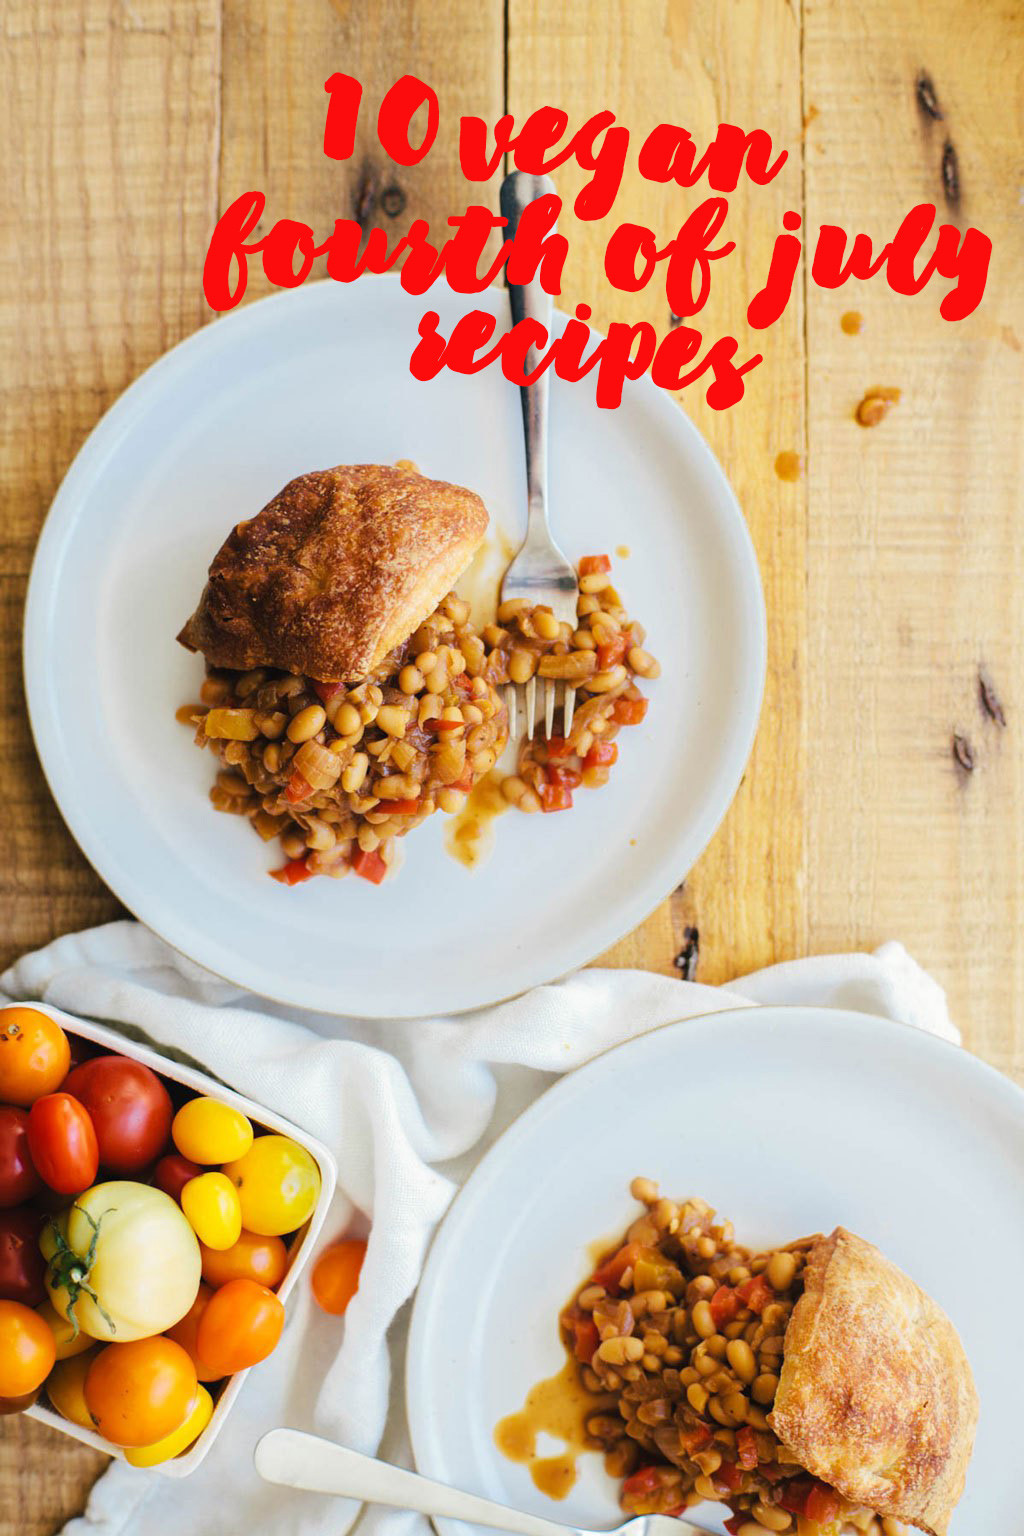 Vegan Fourth Of July Recipes  10 Vegan Fourth of July Recipes